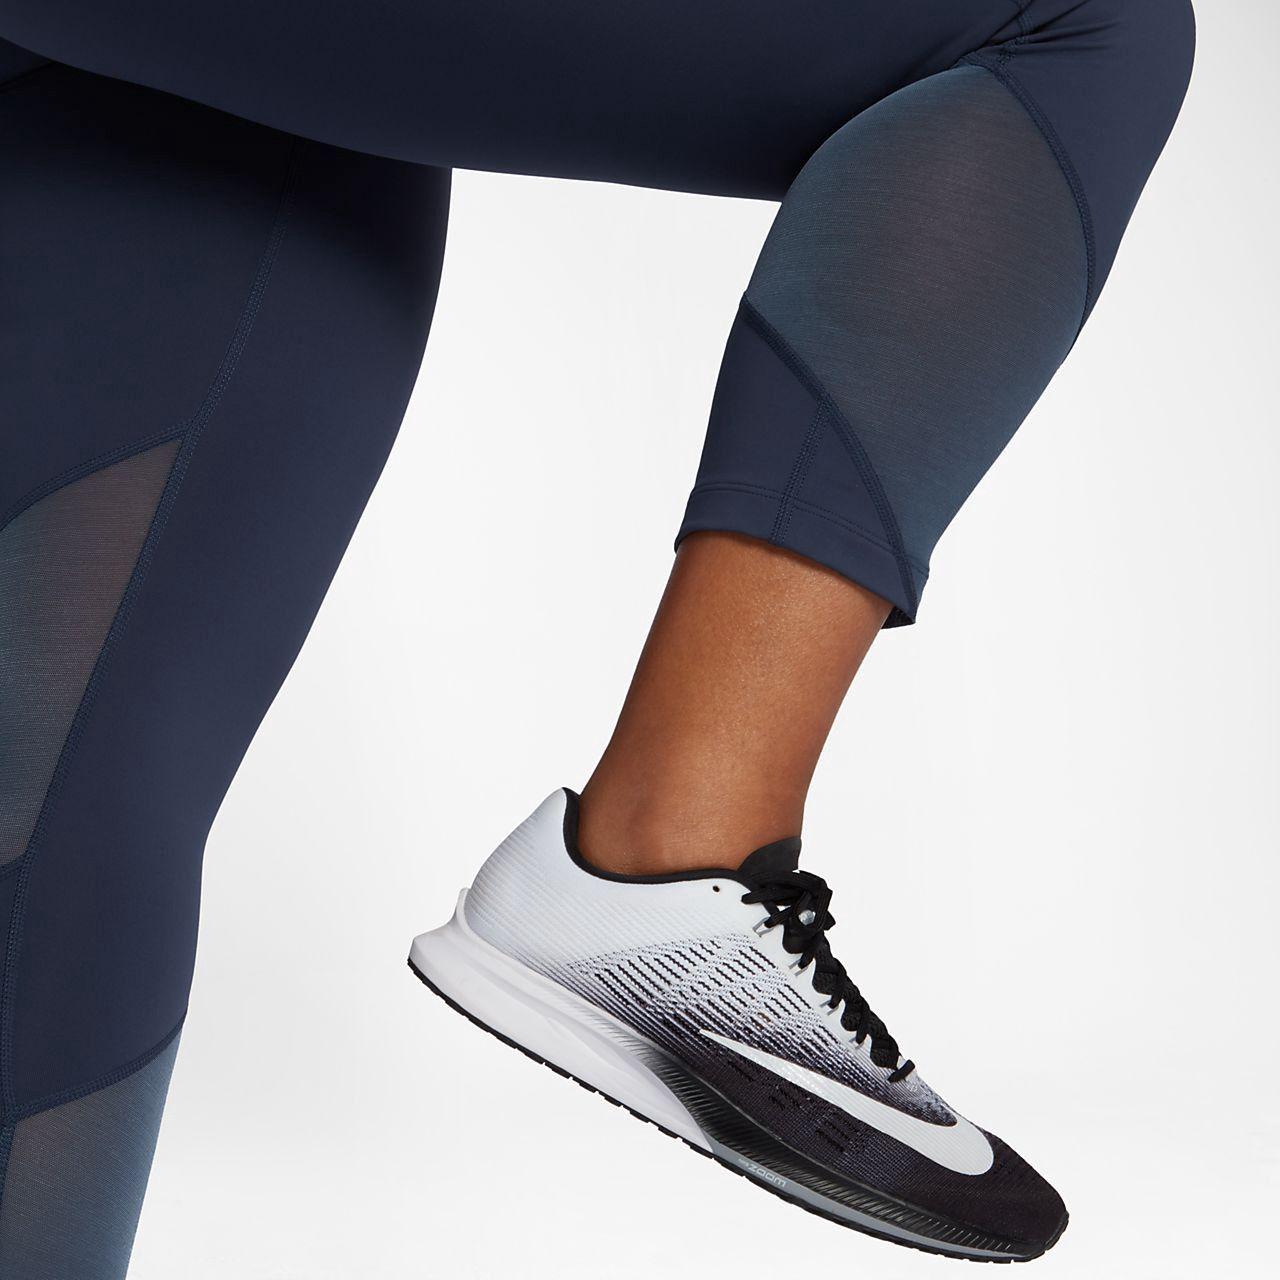 Nike Epic Lux (Plus Size) Women's Running Crops 3X (24W